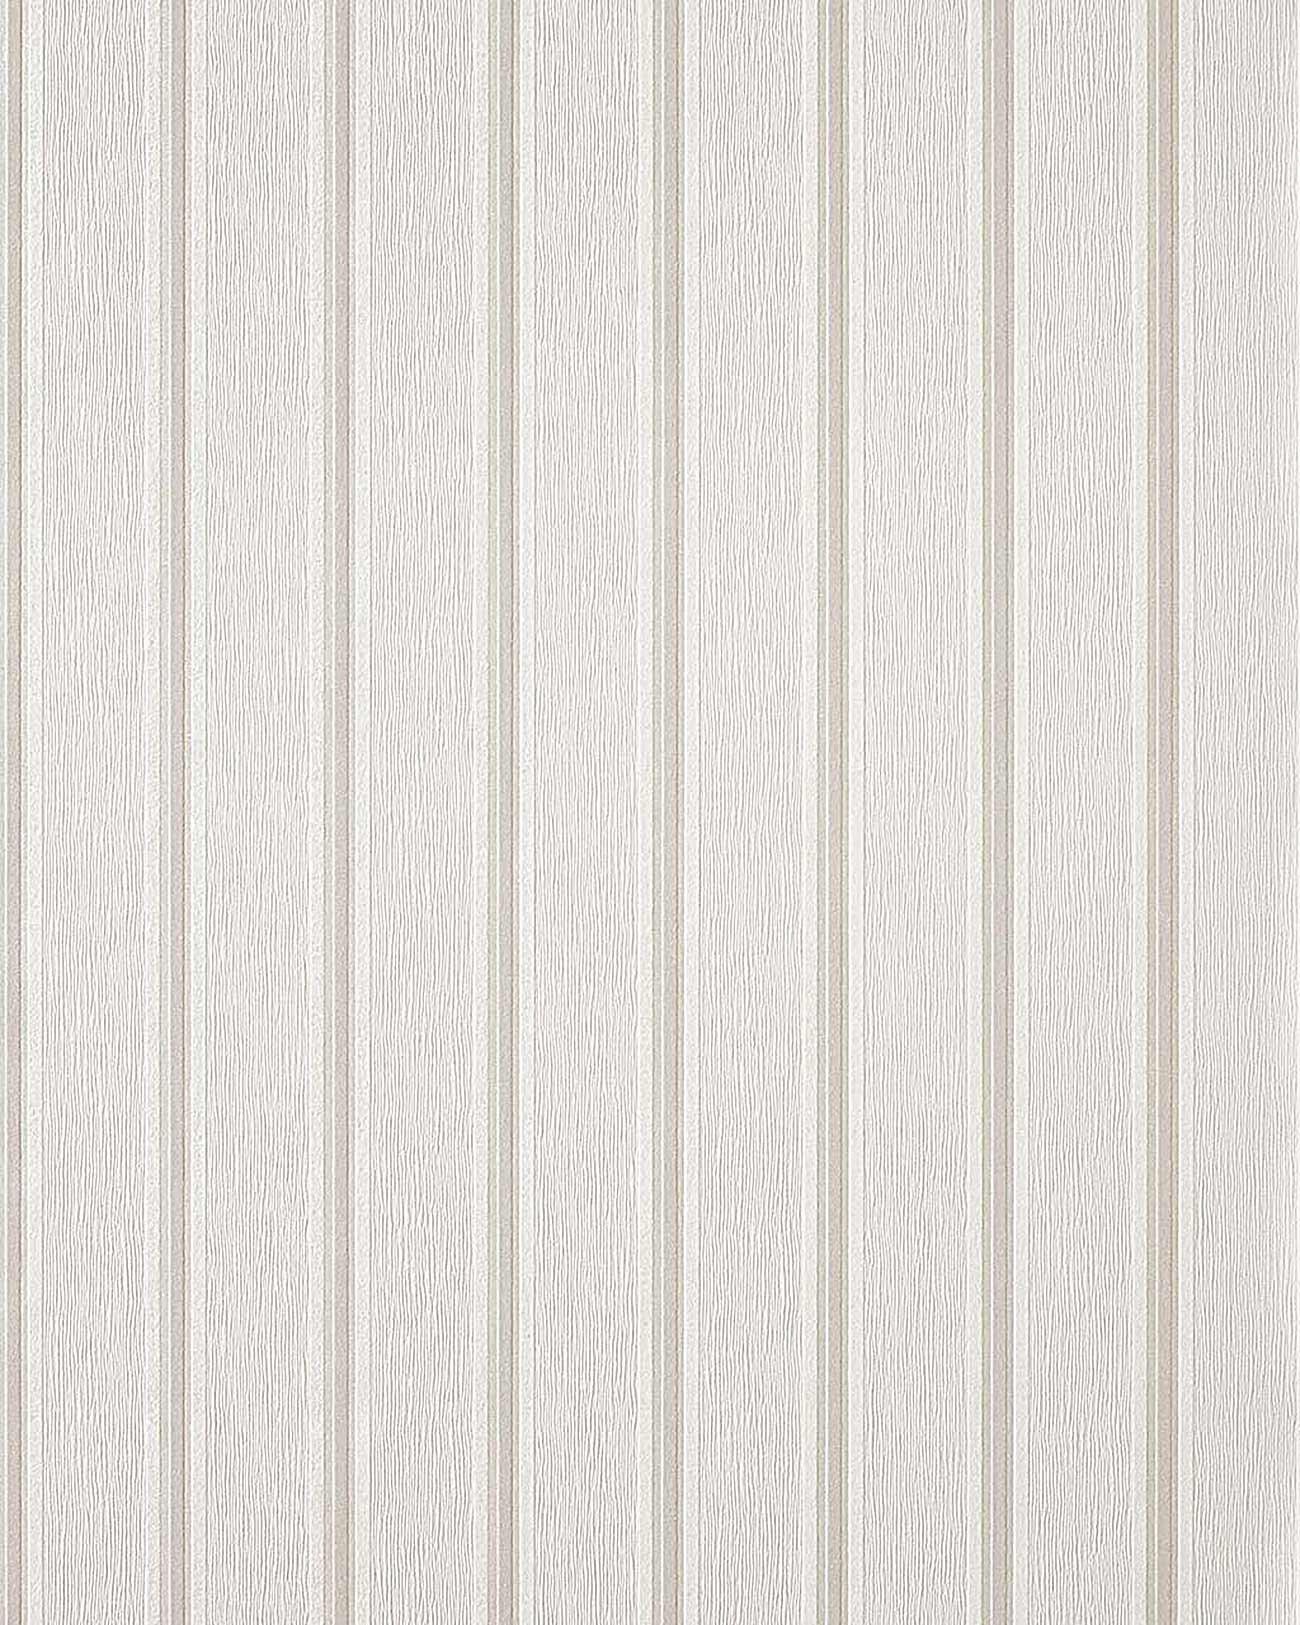 Papel pintado con dise o de rayas del estilo ingl s edem - Fabricantes de papel pintado ...